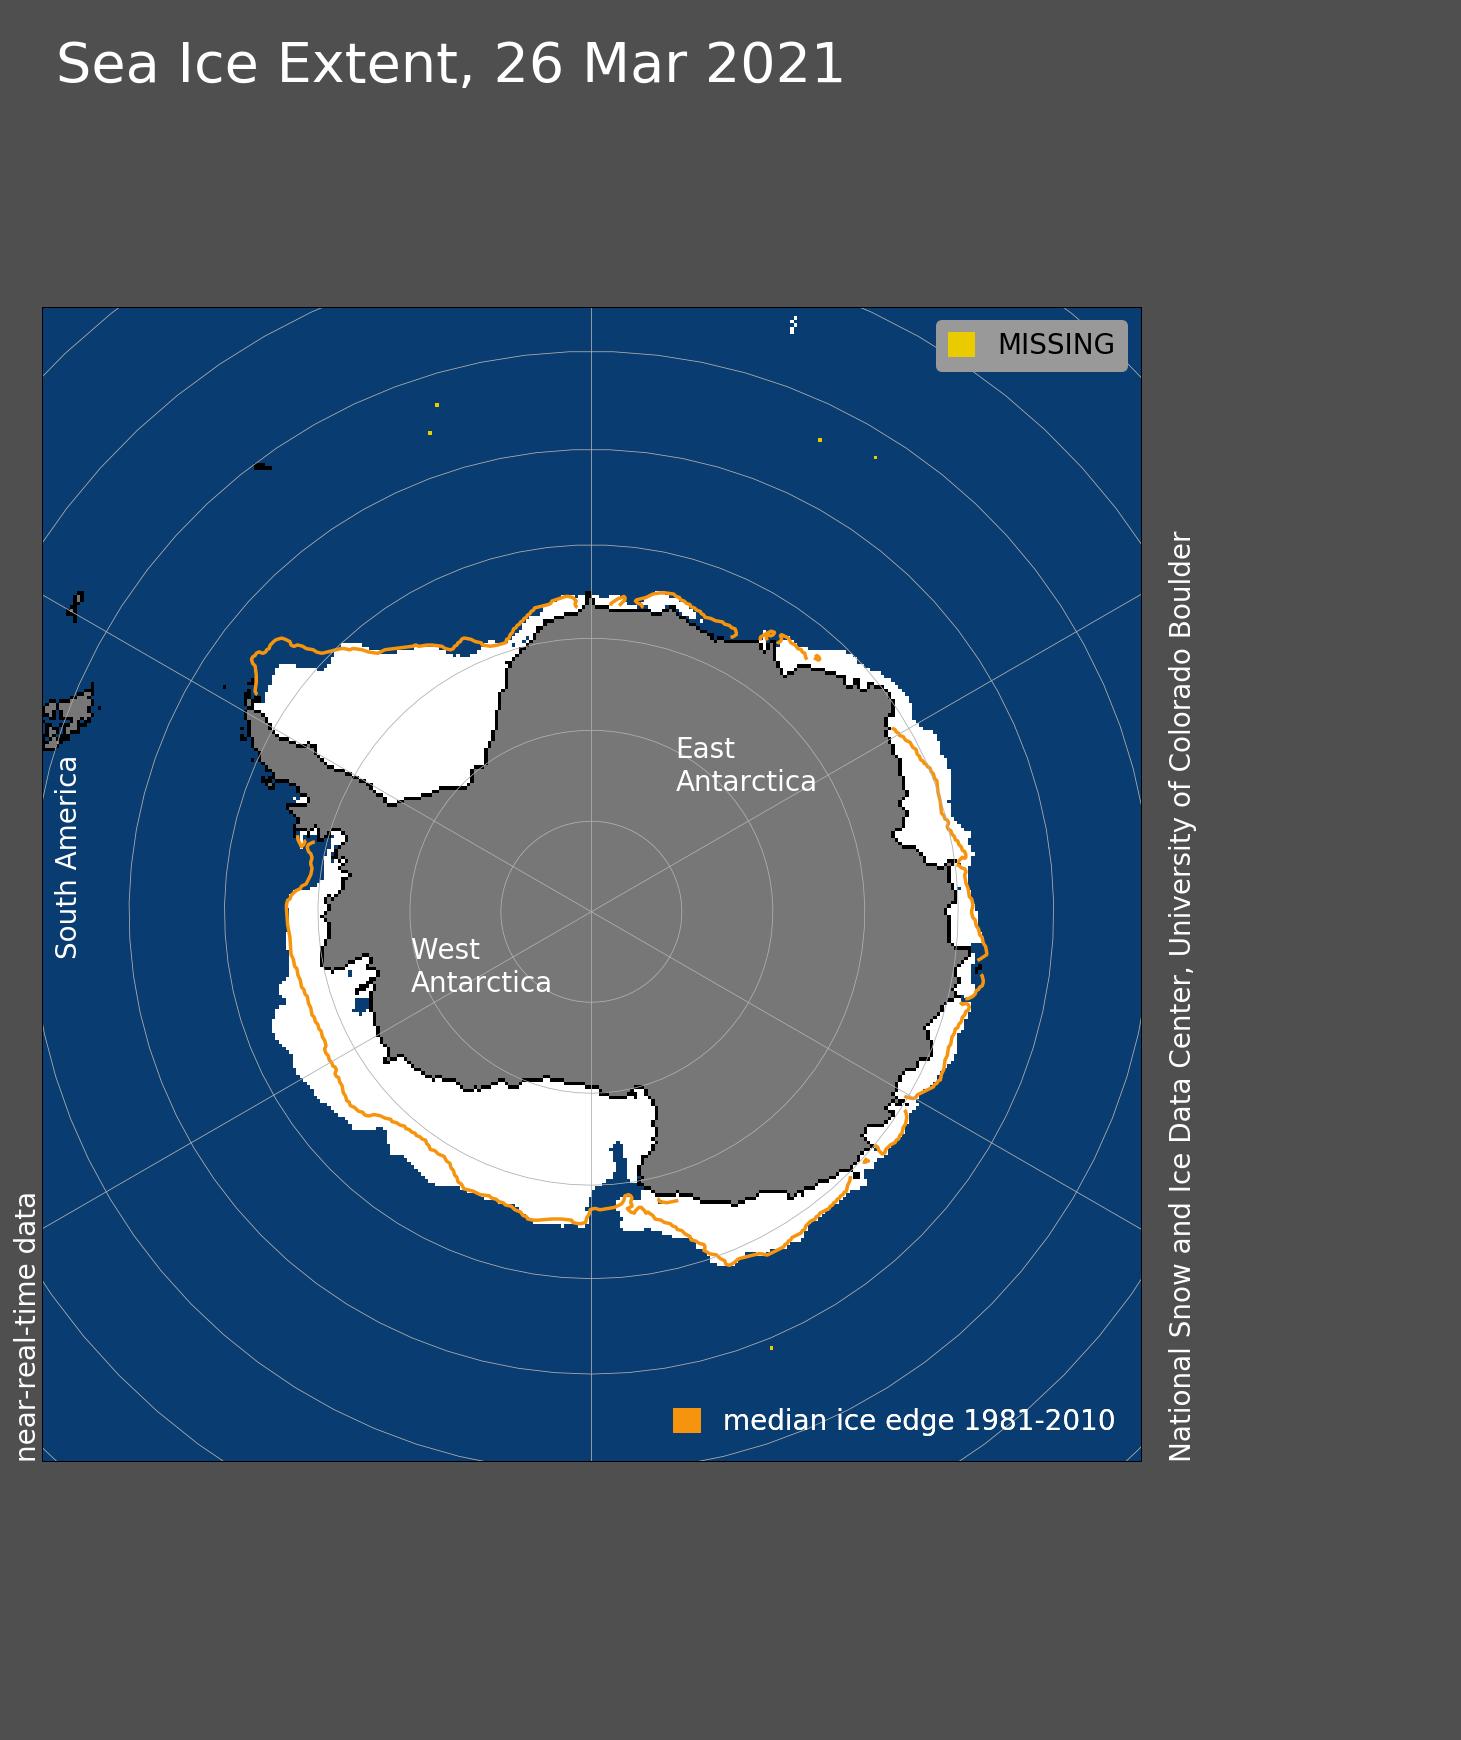 arctic-sea-ice-maximum-2021-melt-antarctic-extent-analysis